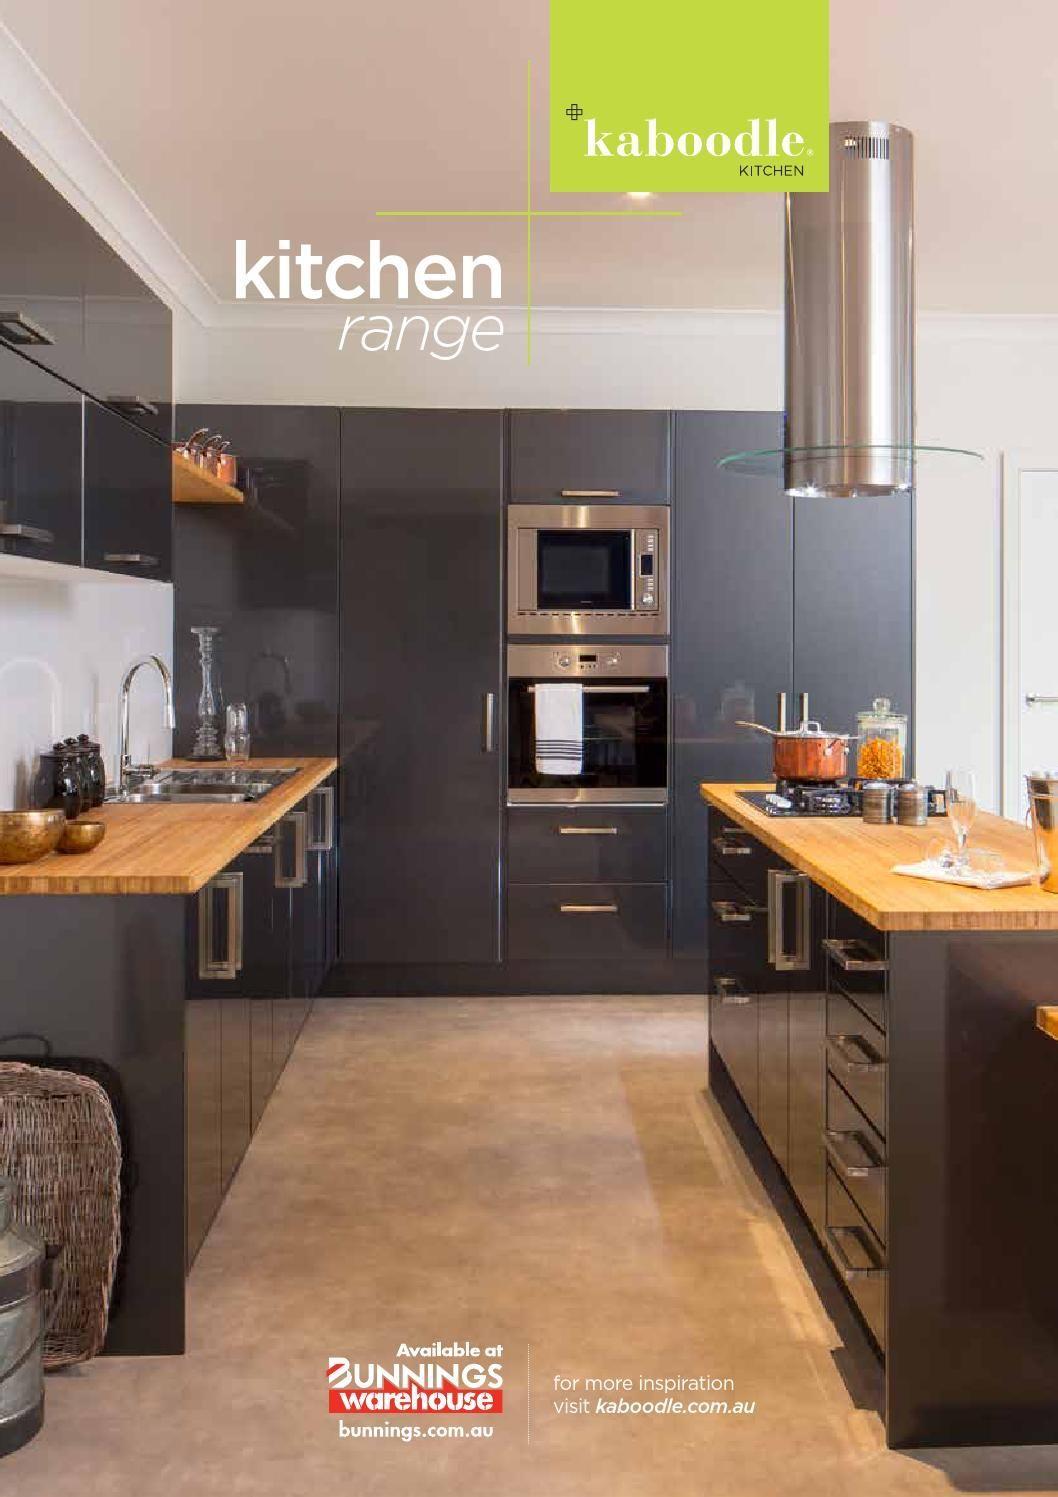 kaboodle kitchen australian catalogue kitchen kitchen storage new kitchen on kaboodle kitchen storage id=93736